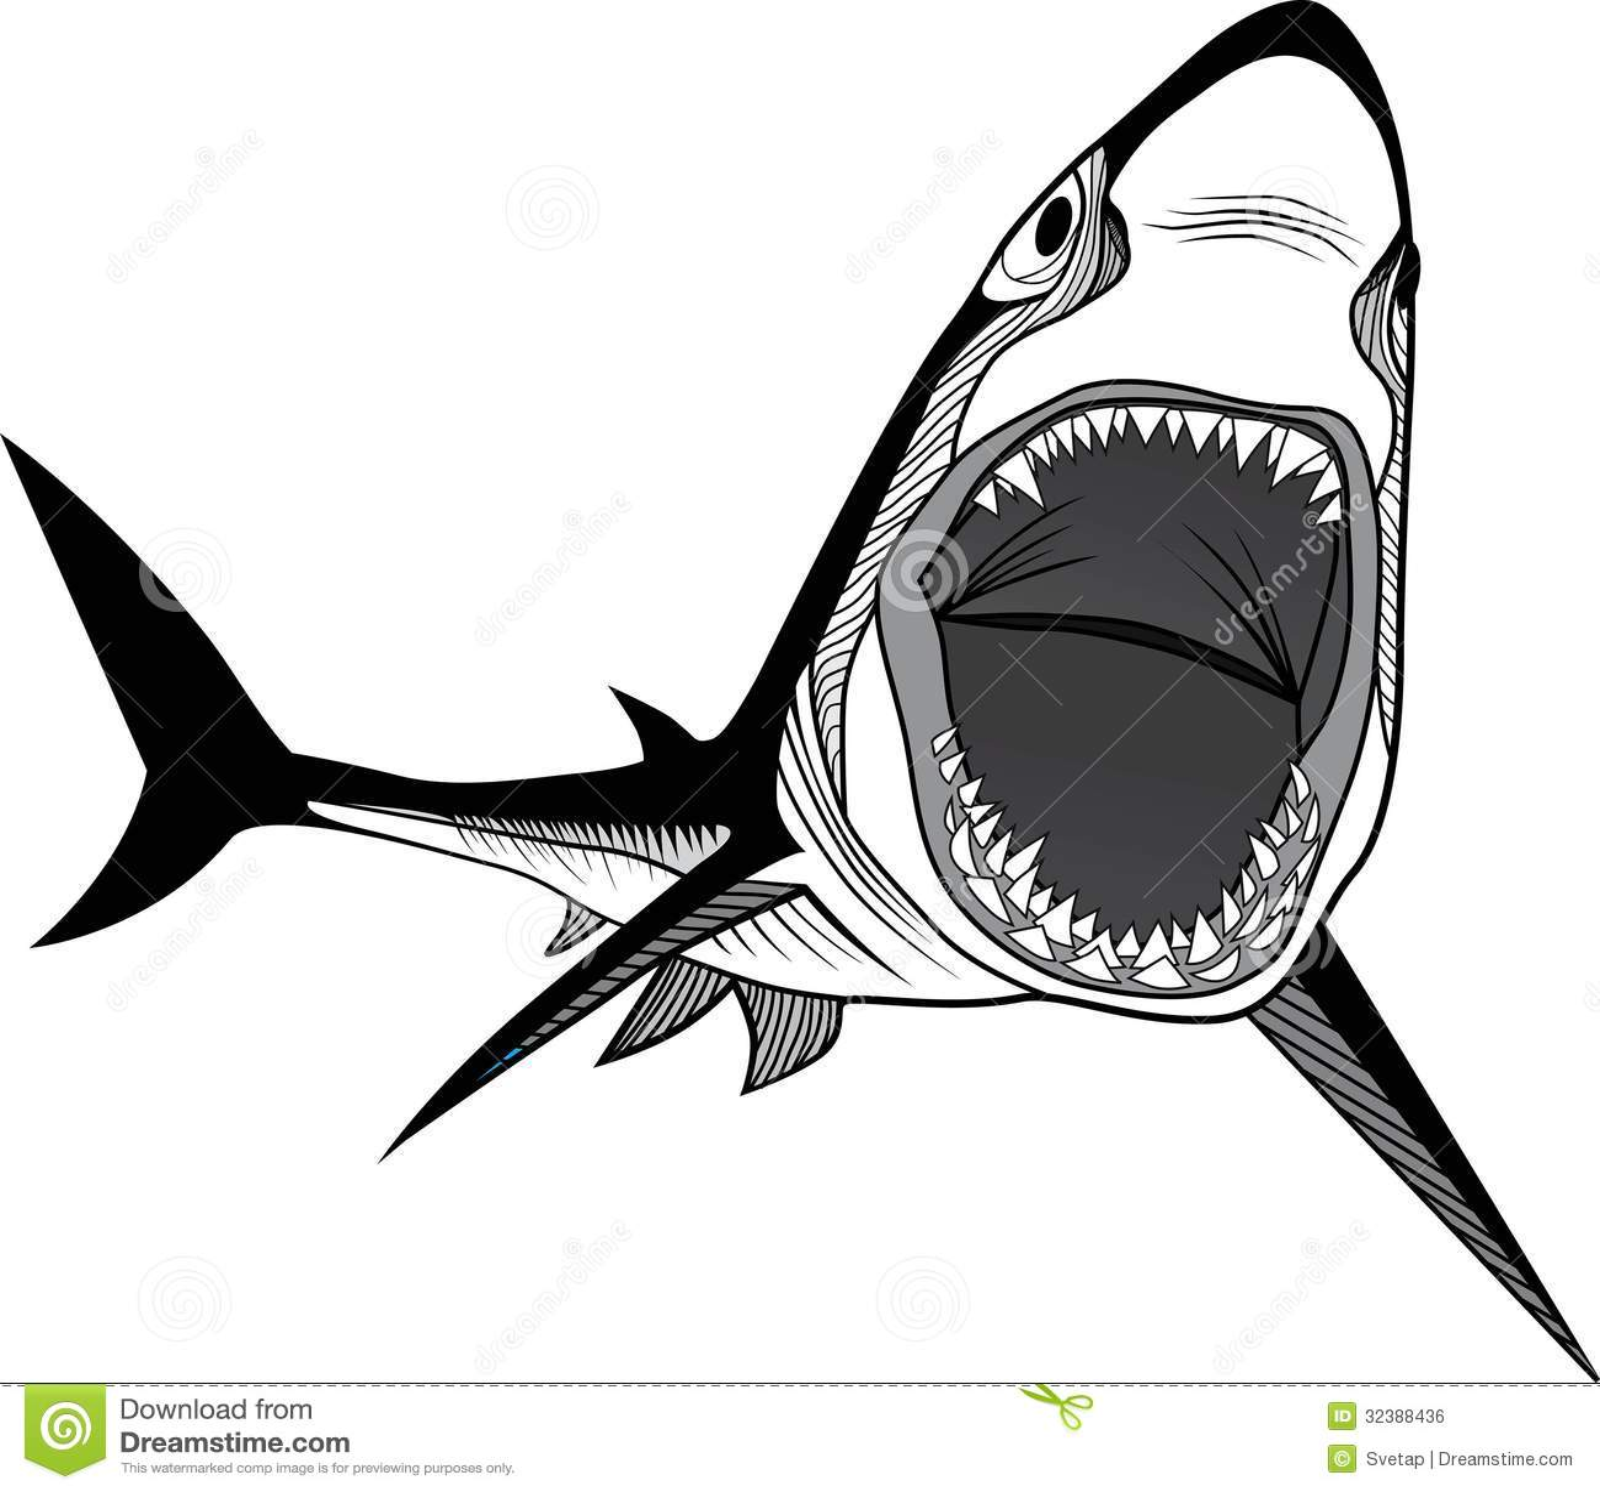 Shark Fish Head Stock Photo. Image Of Ocean Monster - 32388436